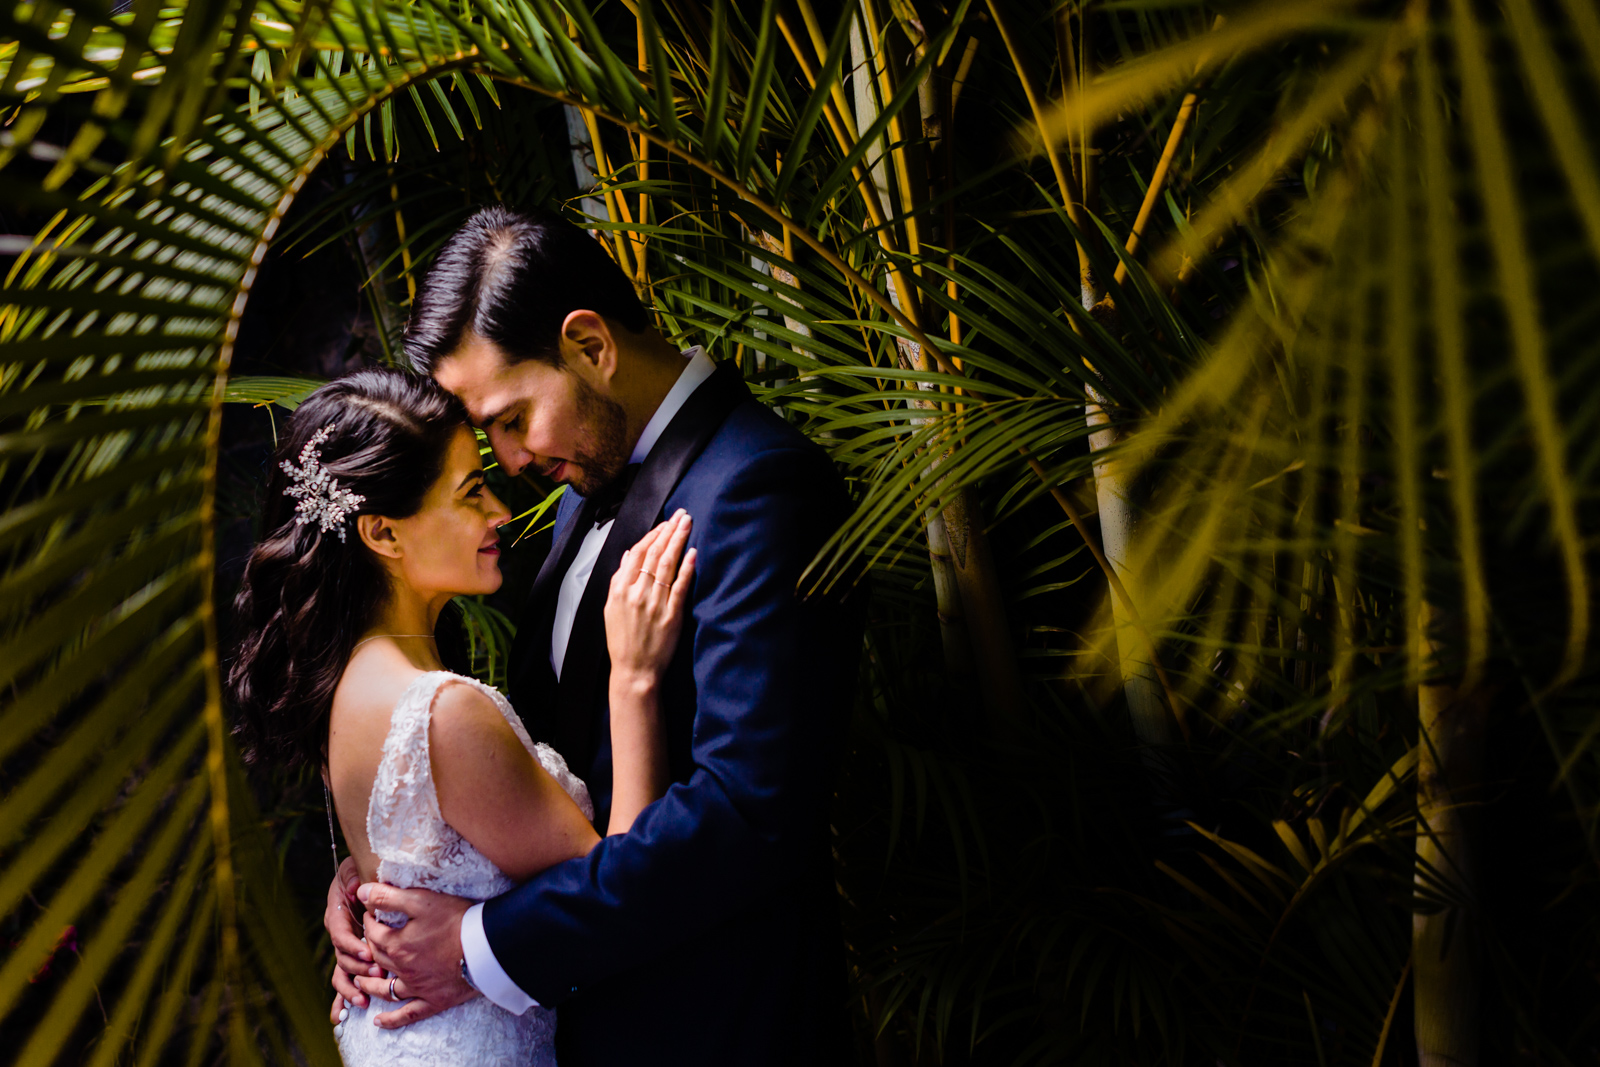 bride and groom hugs on a green garden